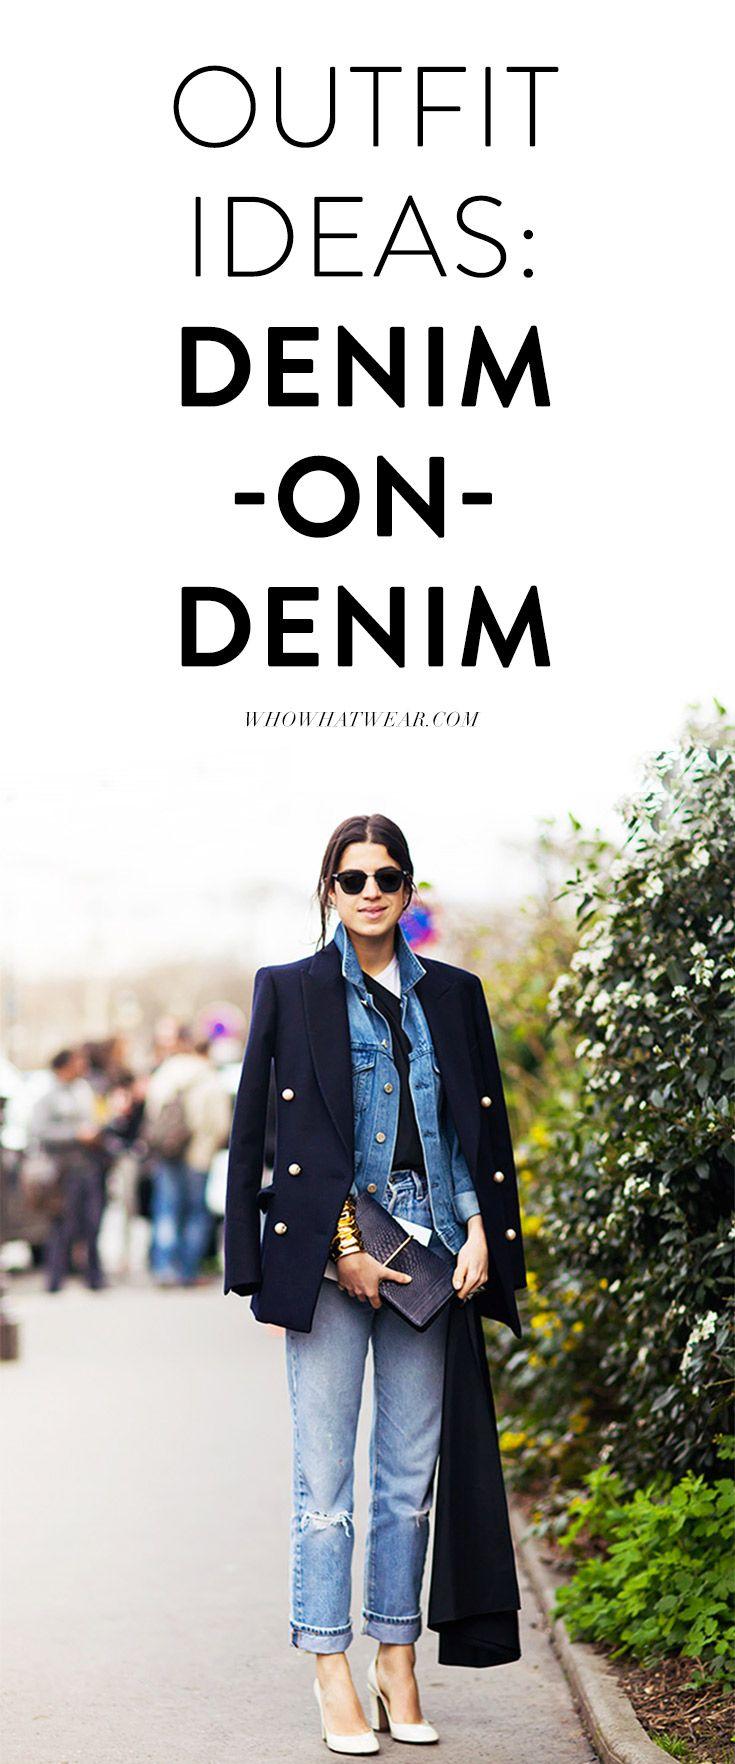 Styling tricks to wear the denim-on-denim look. // denim outfits